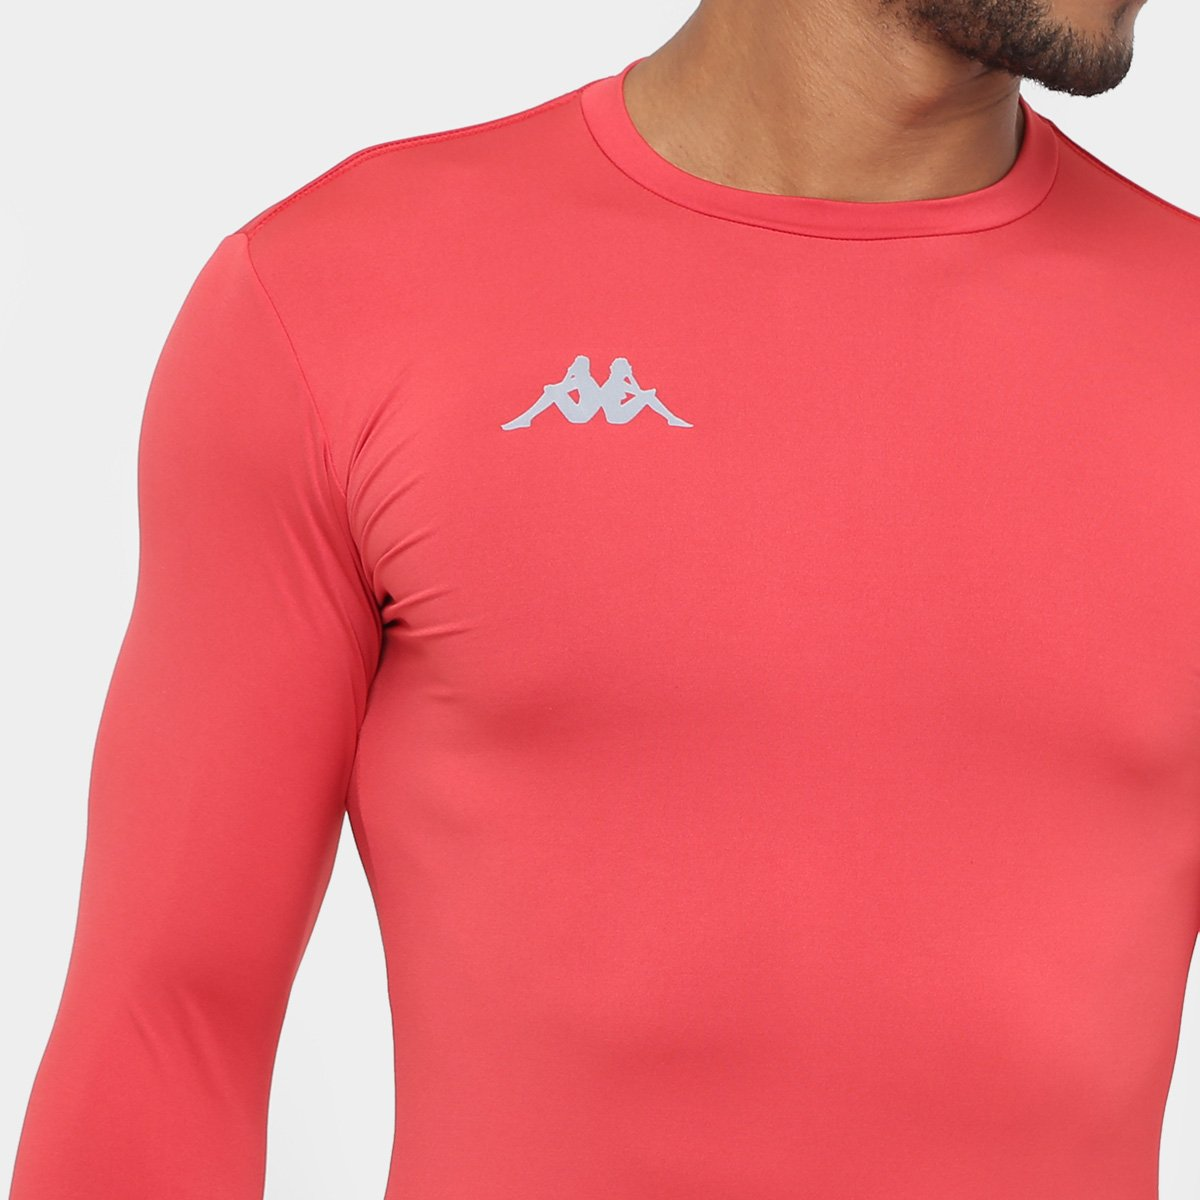 d75c14b1f7432 ... Camiseta Kappa Térmica Grip Manga Longa Masculina - Vermelho. EXCLUSIVO